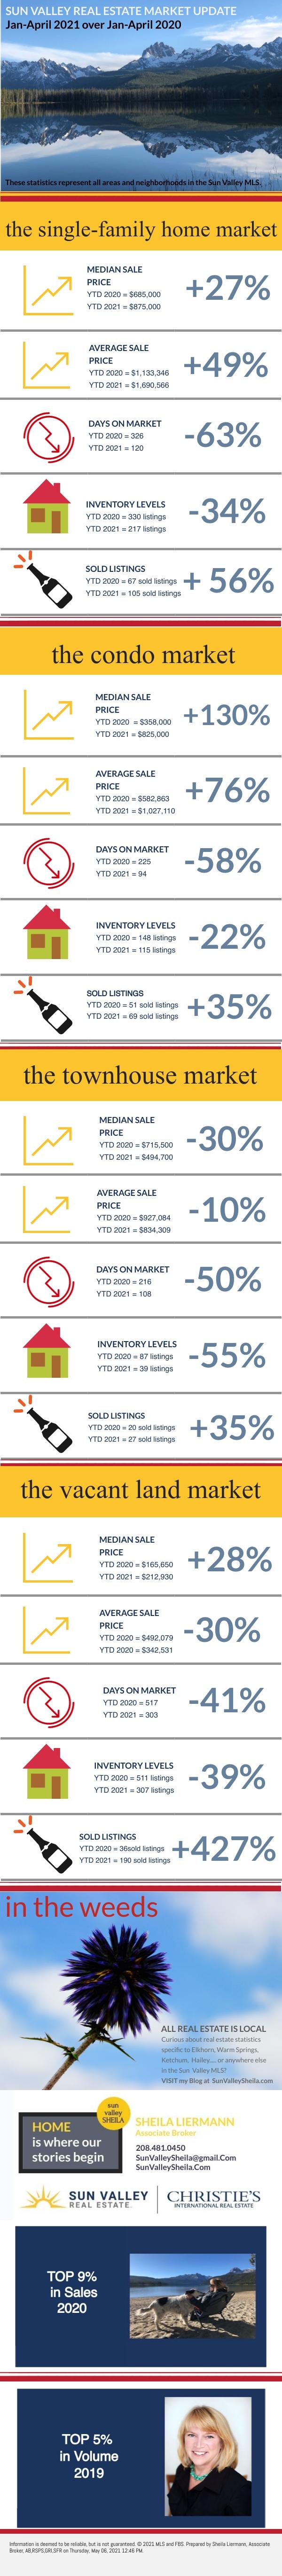 Comparing Sun Valley Real Estate Jan-April 2021 over Jan-April 2020